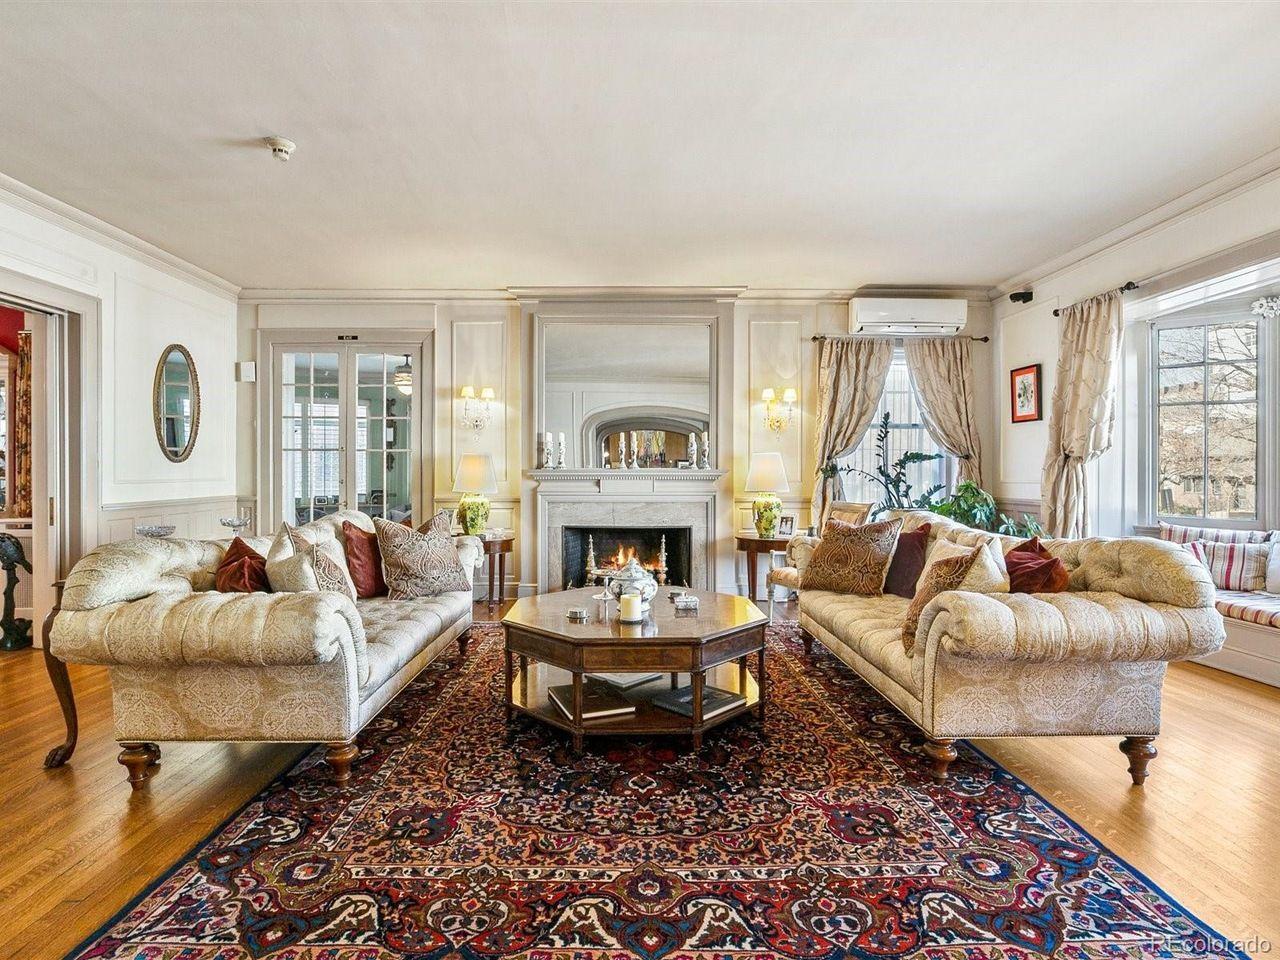 1350 N. Logan St formal living room